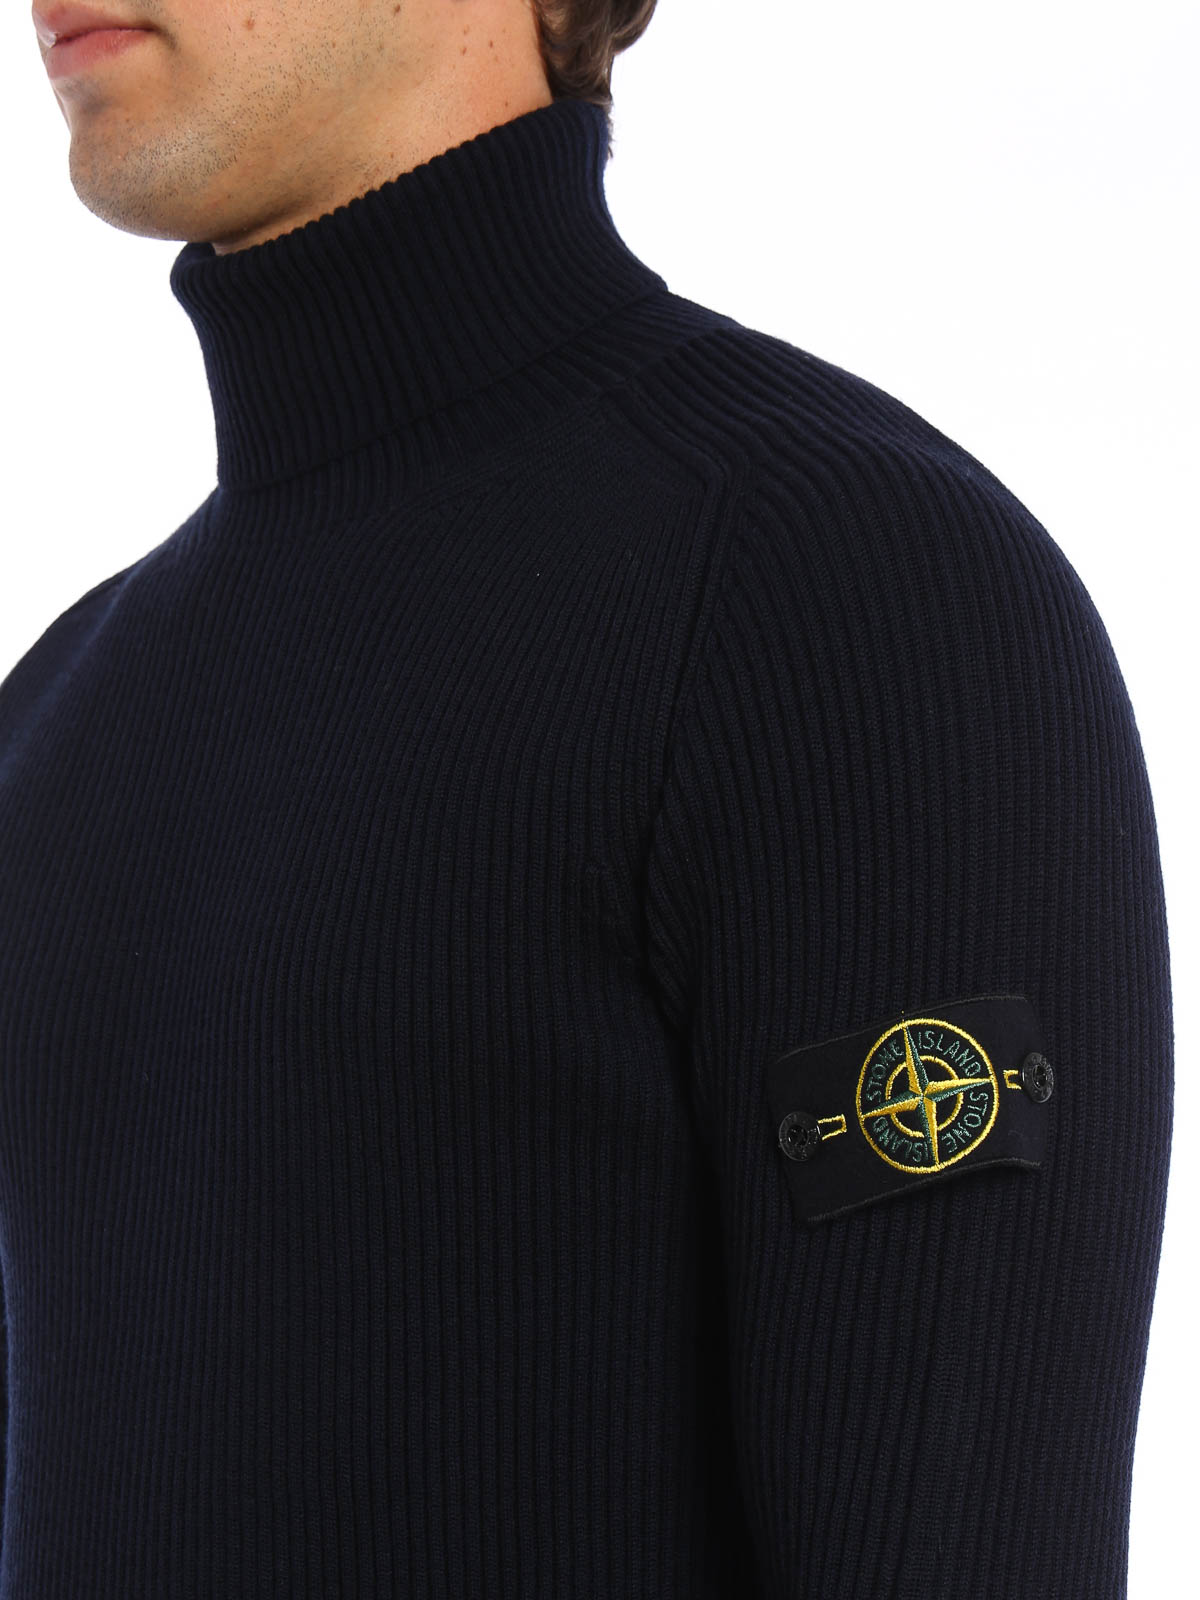 Stone Island Rollkragen Polo Ausschnitt Sweater